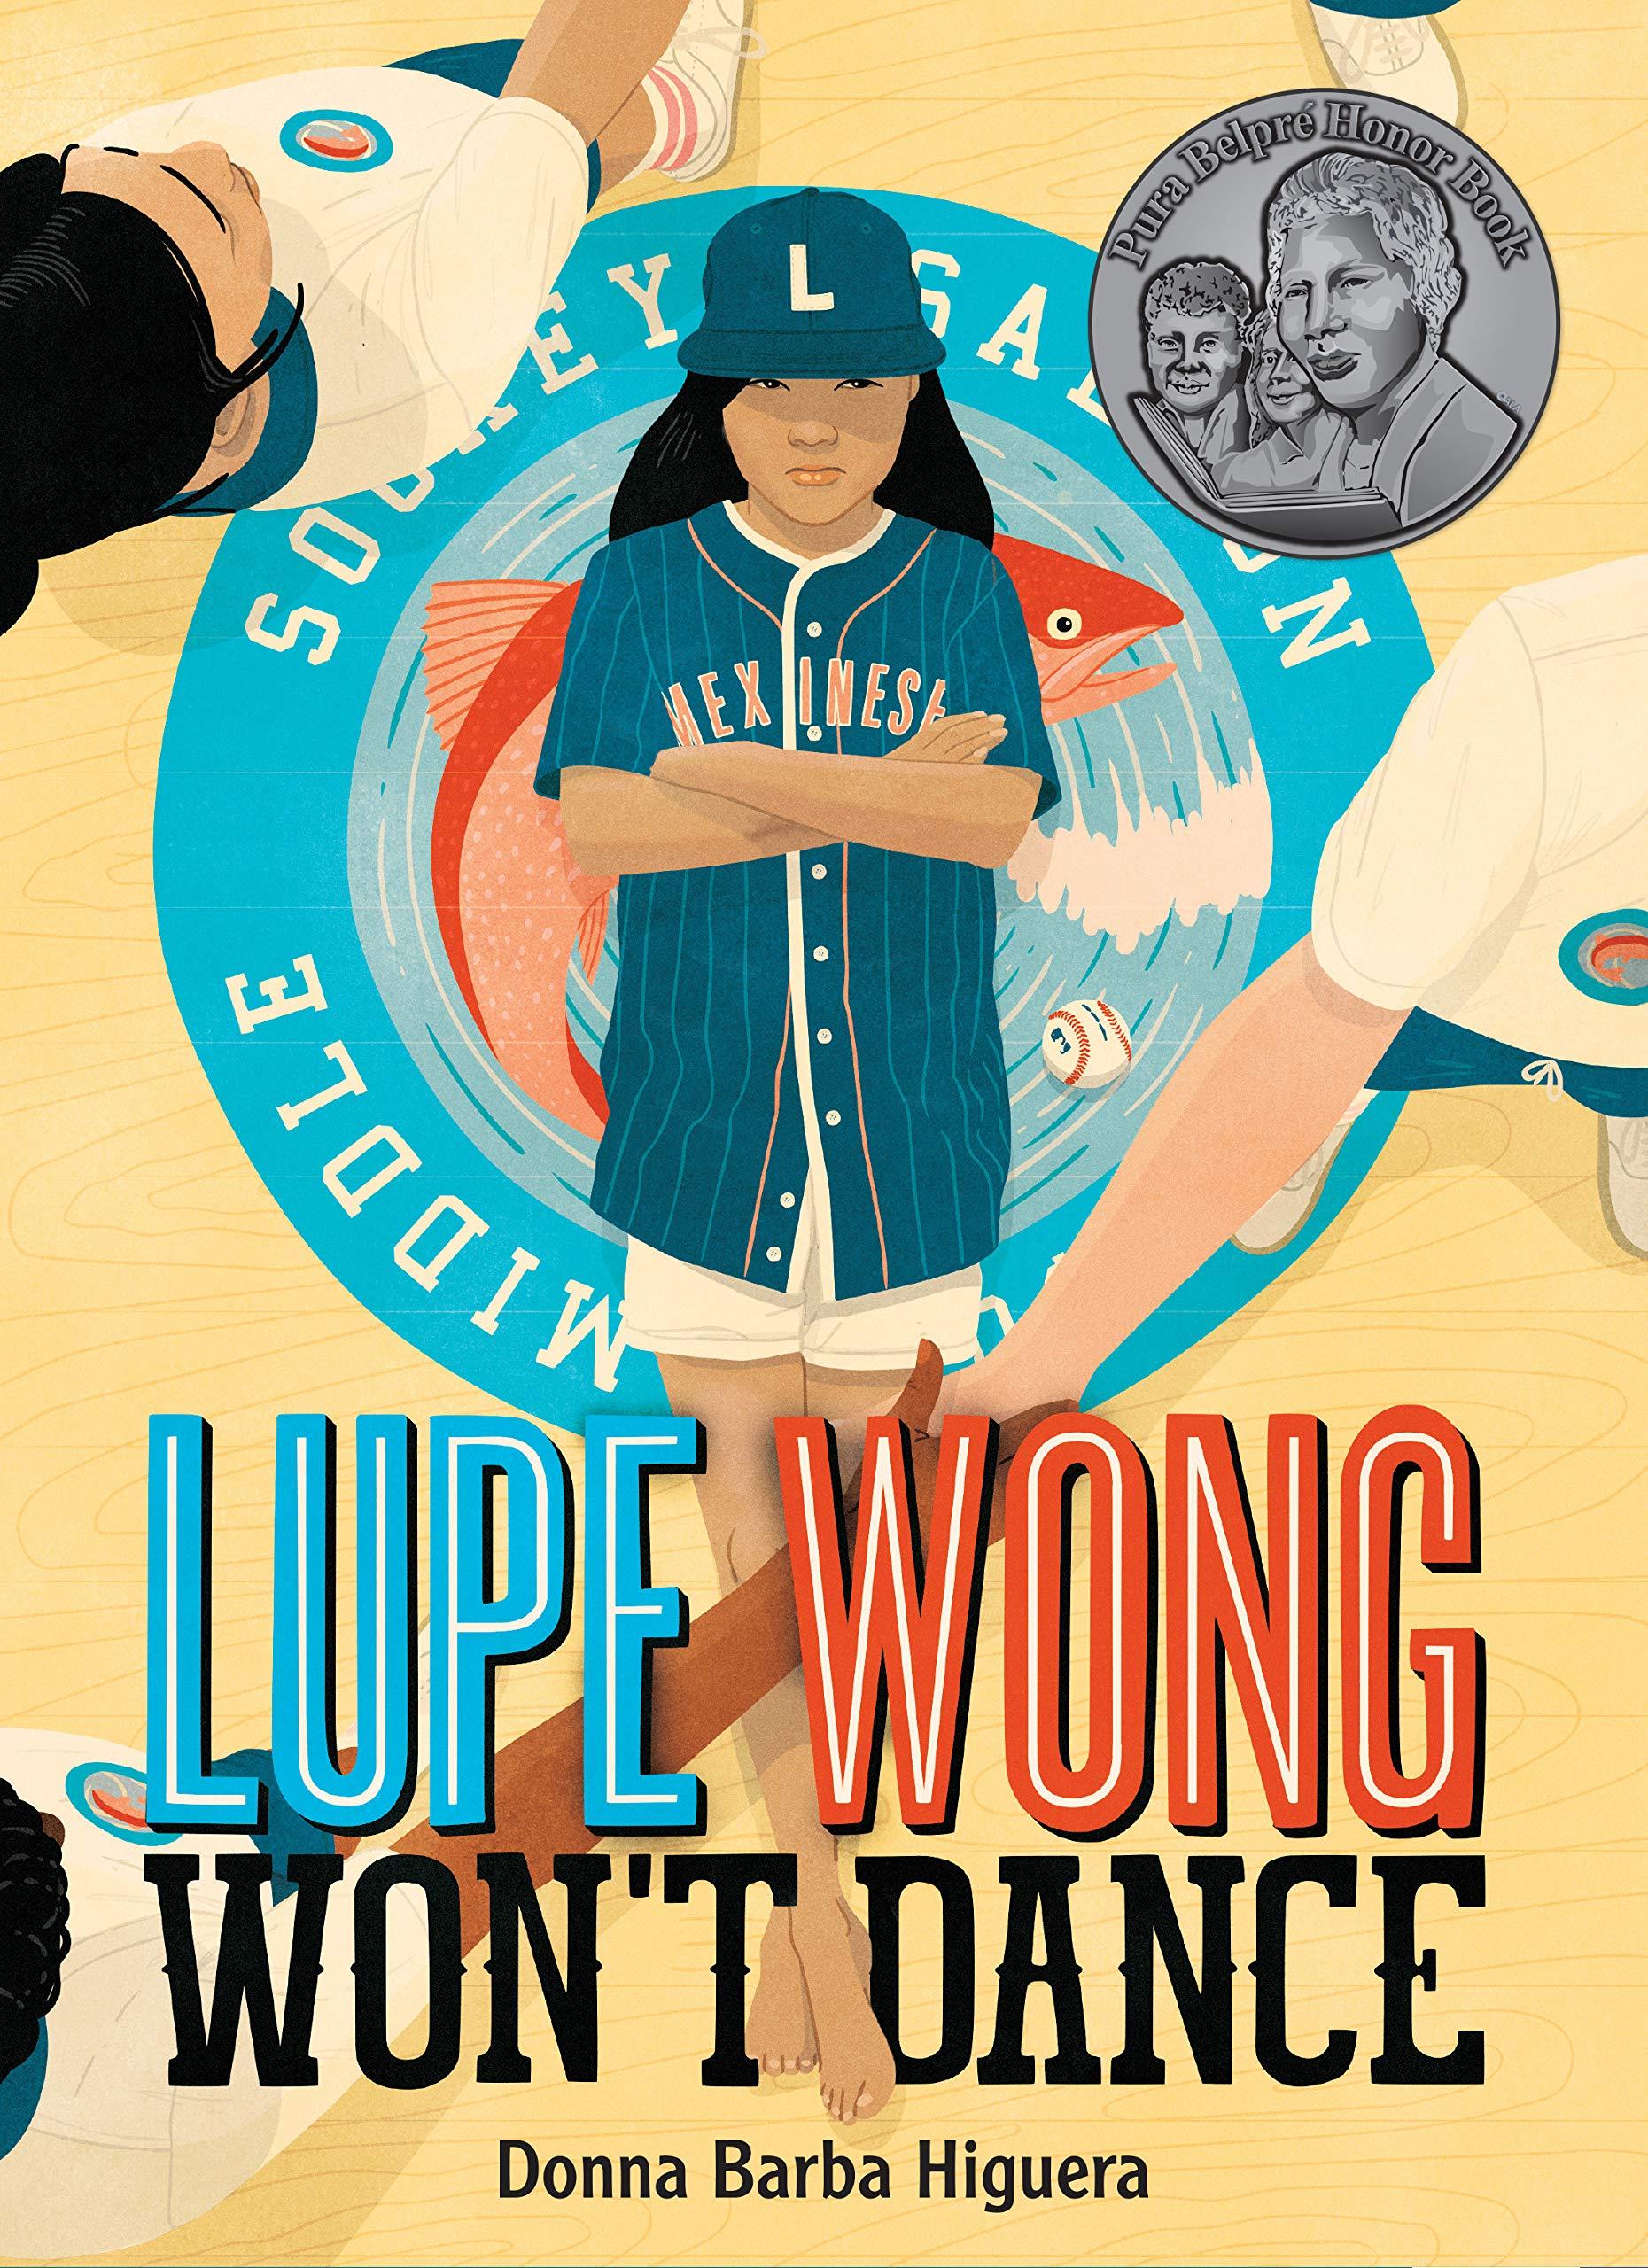 Lupe Wong Won't Dance: Higuera, Donna Barba: 9781646140039: Amazon.com:  Books